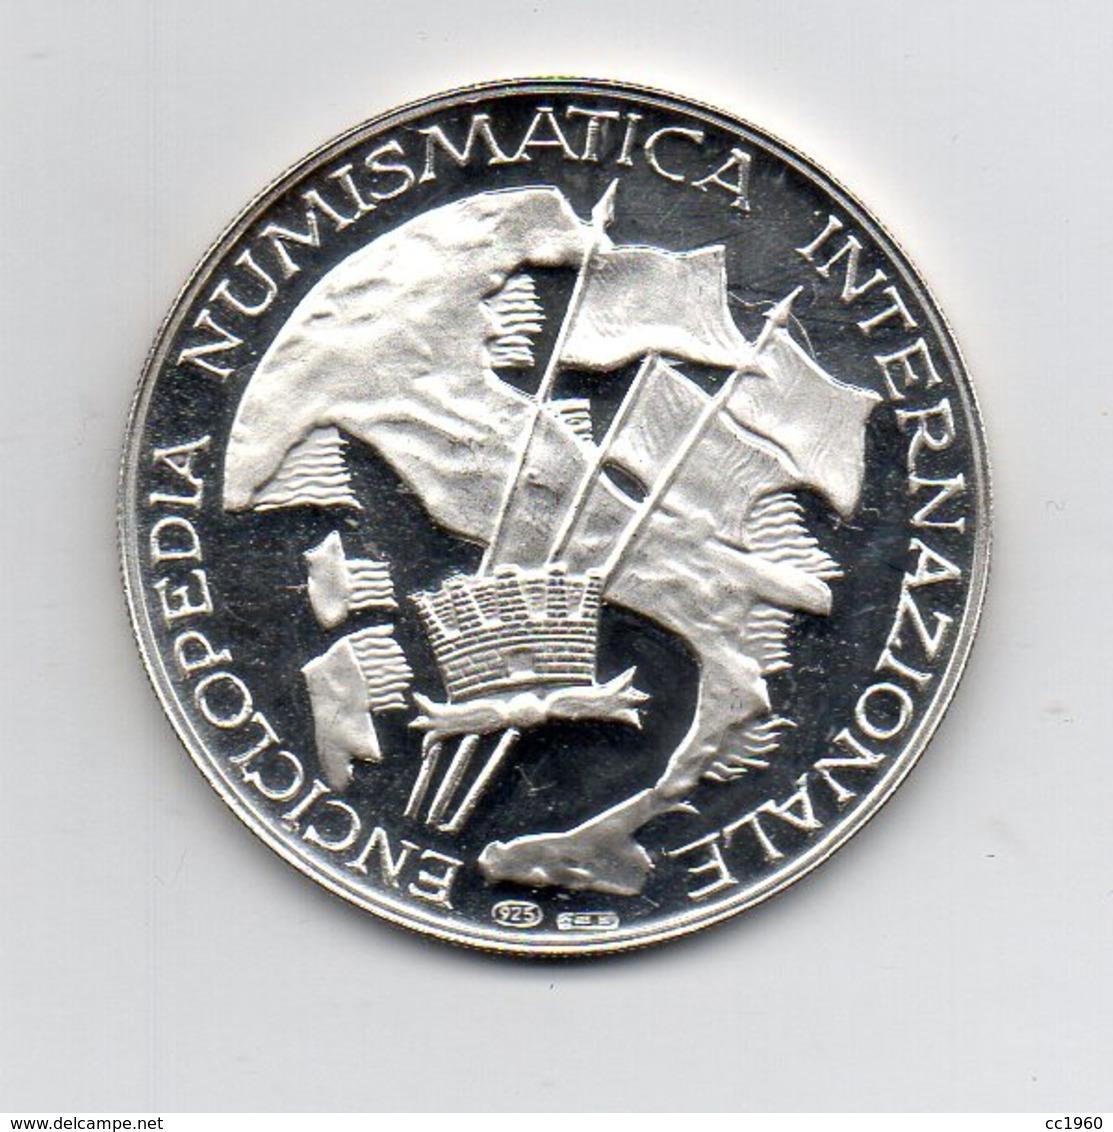 Italia - Medaglia  - ENCICLOPEDIA NUMISMATICA INTERNAZIONALE - Leonardo Da Vinci - Argento 925 - (MW2277) - Otros